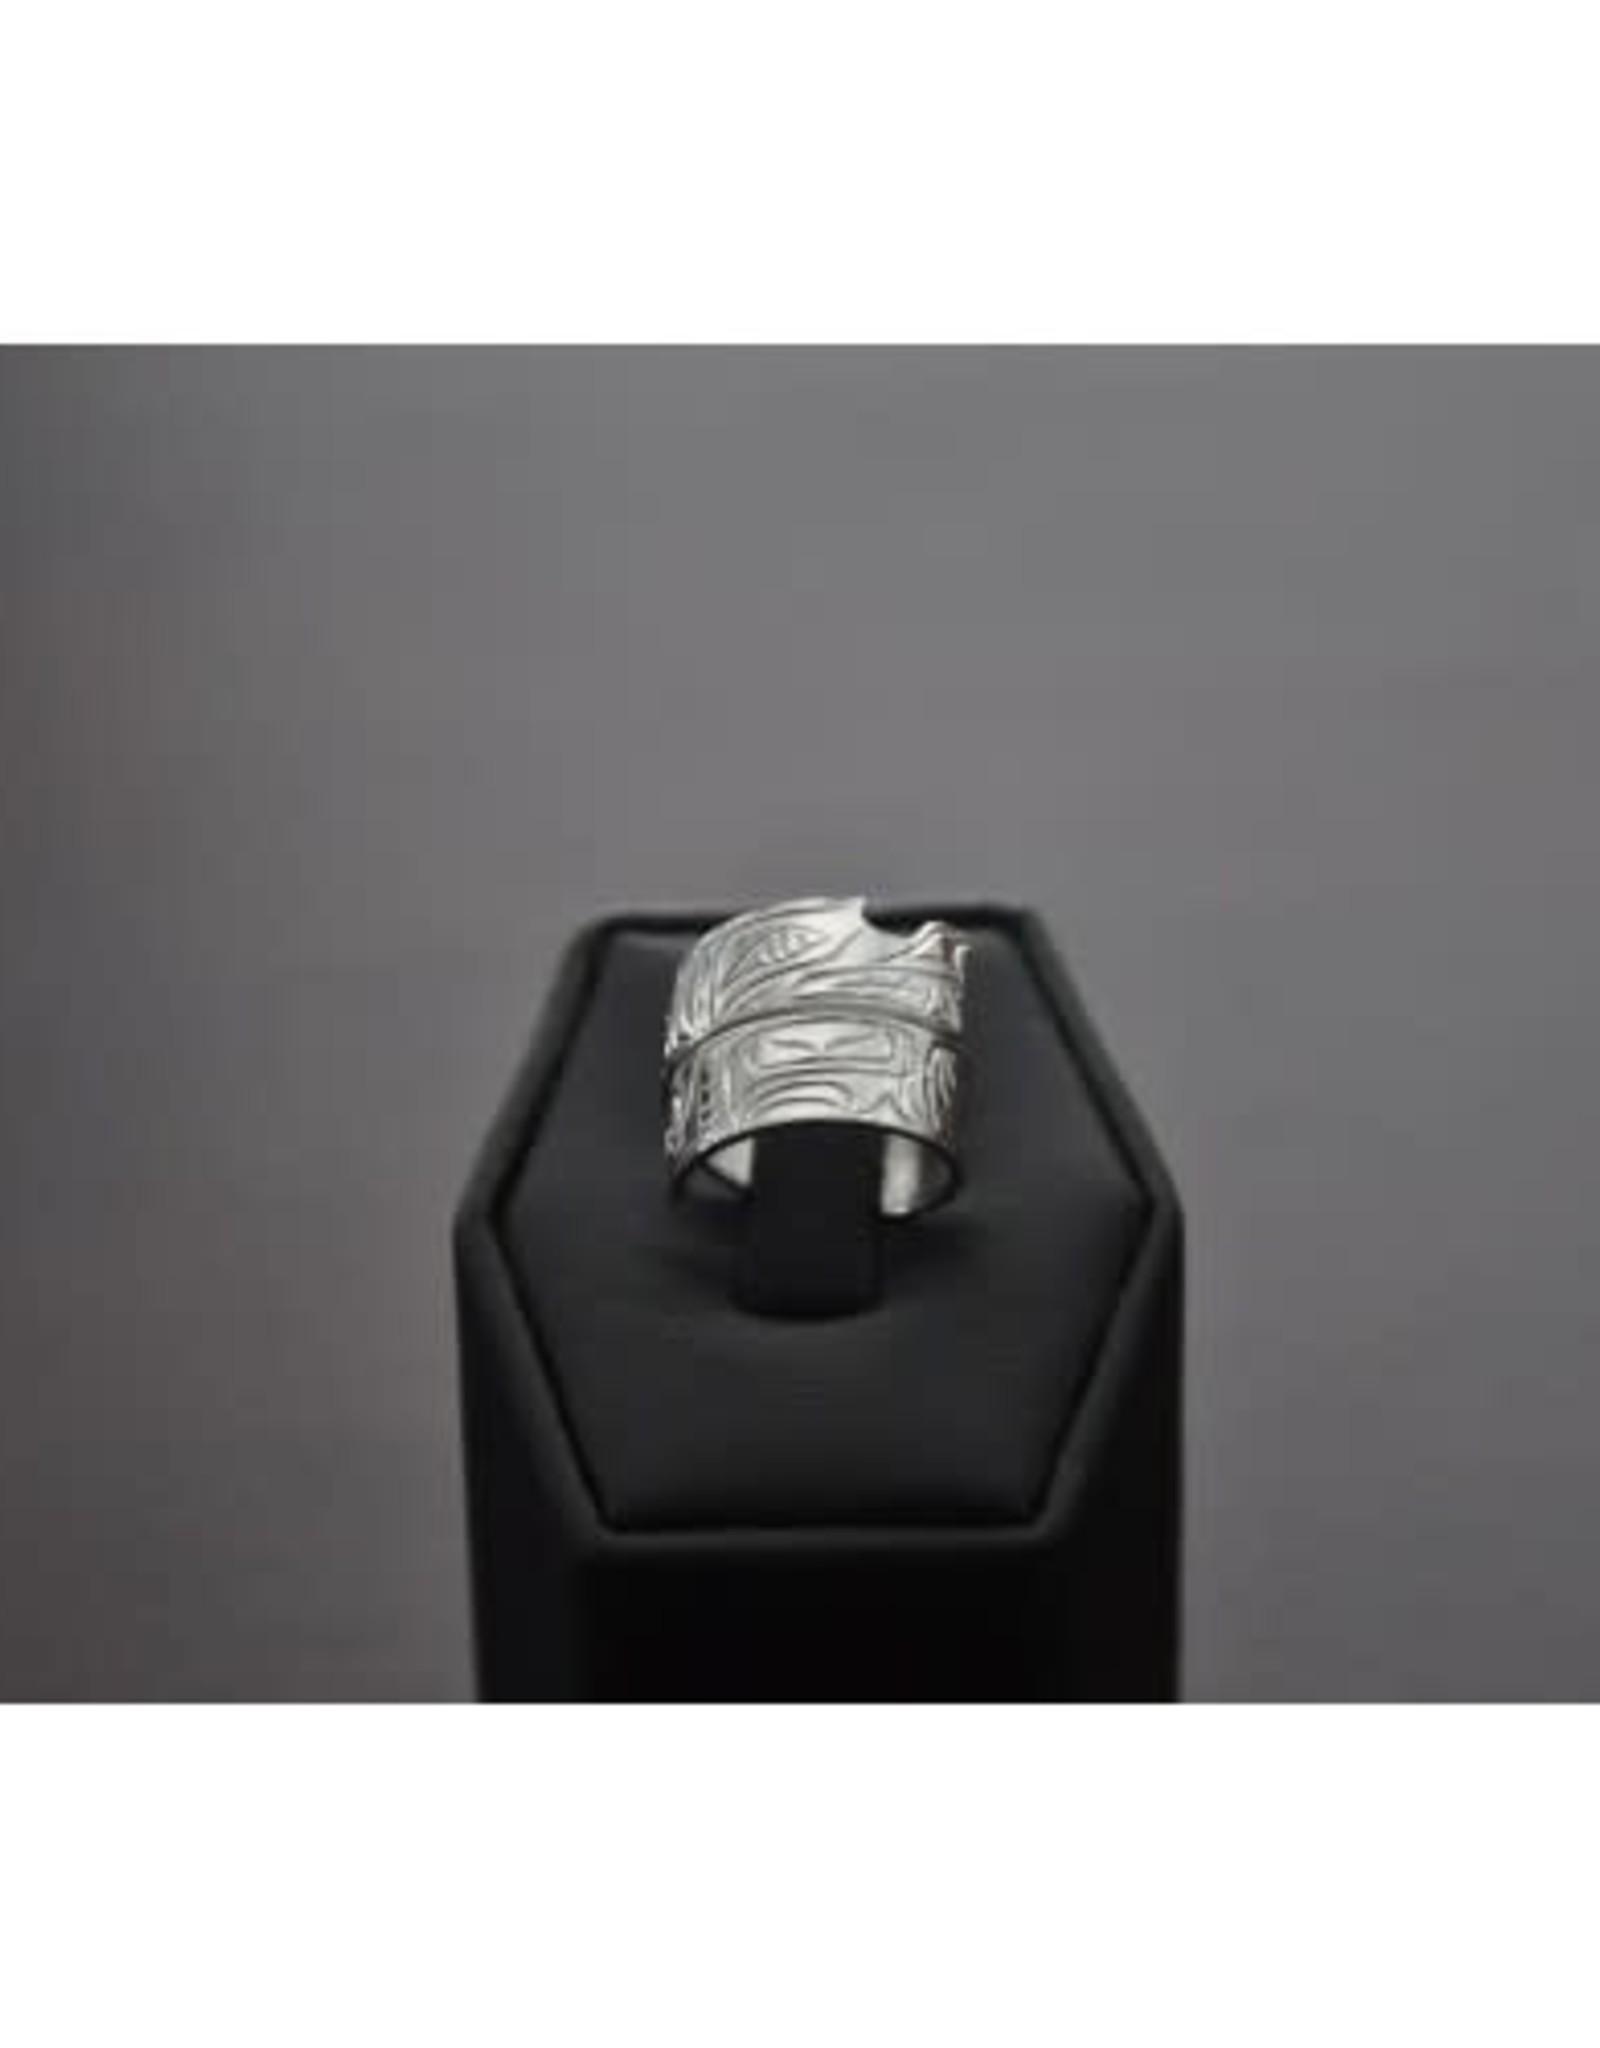 Hand Carved Silver Wrap Ring  Size 8 -Bear by Nancy Dawson